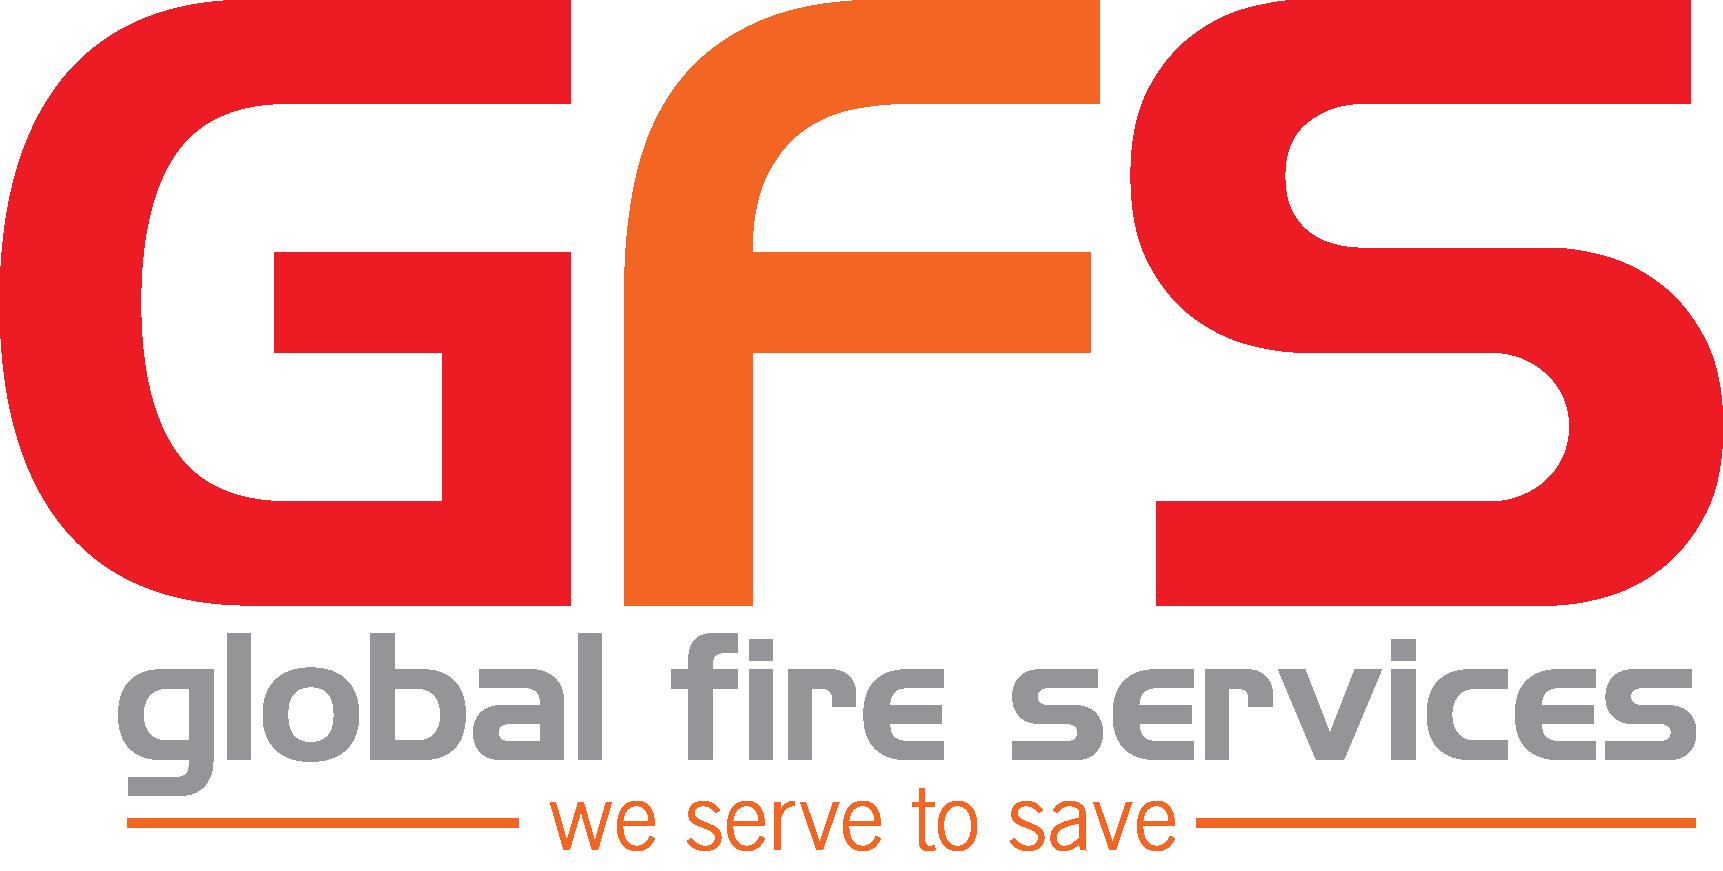 Drill clipart mock drill. Gfs logo png contact